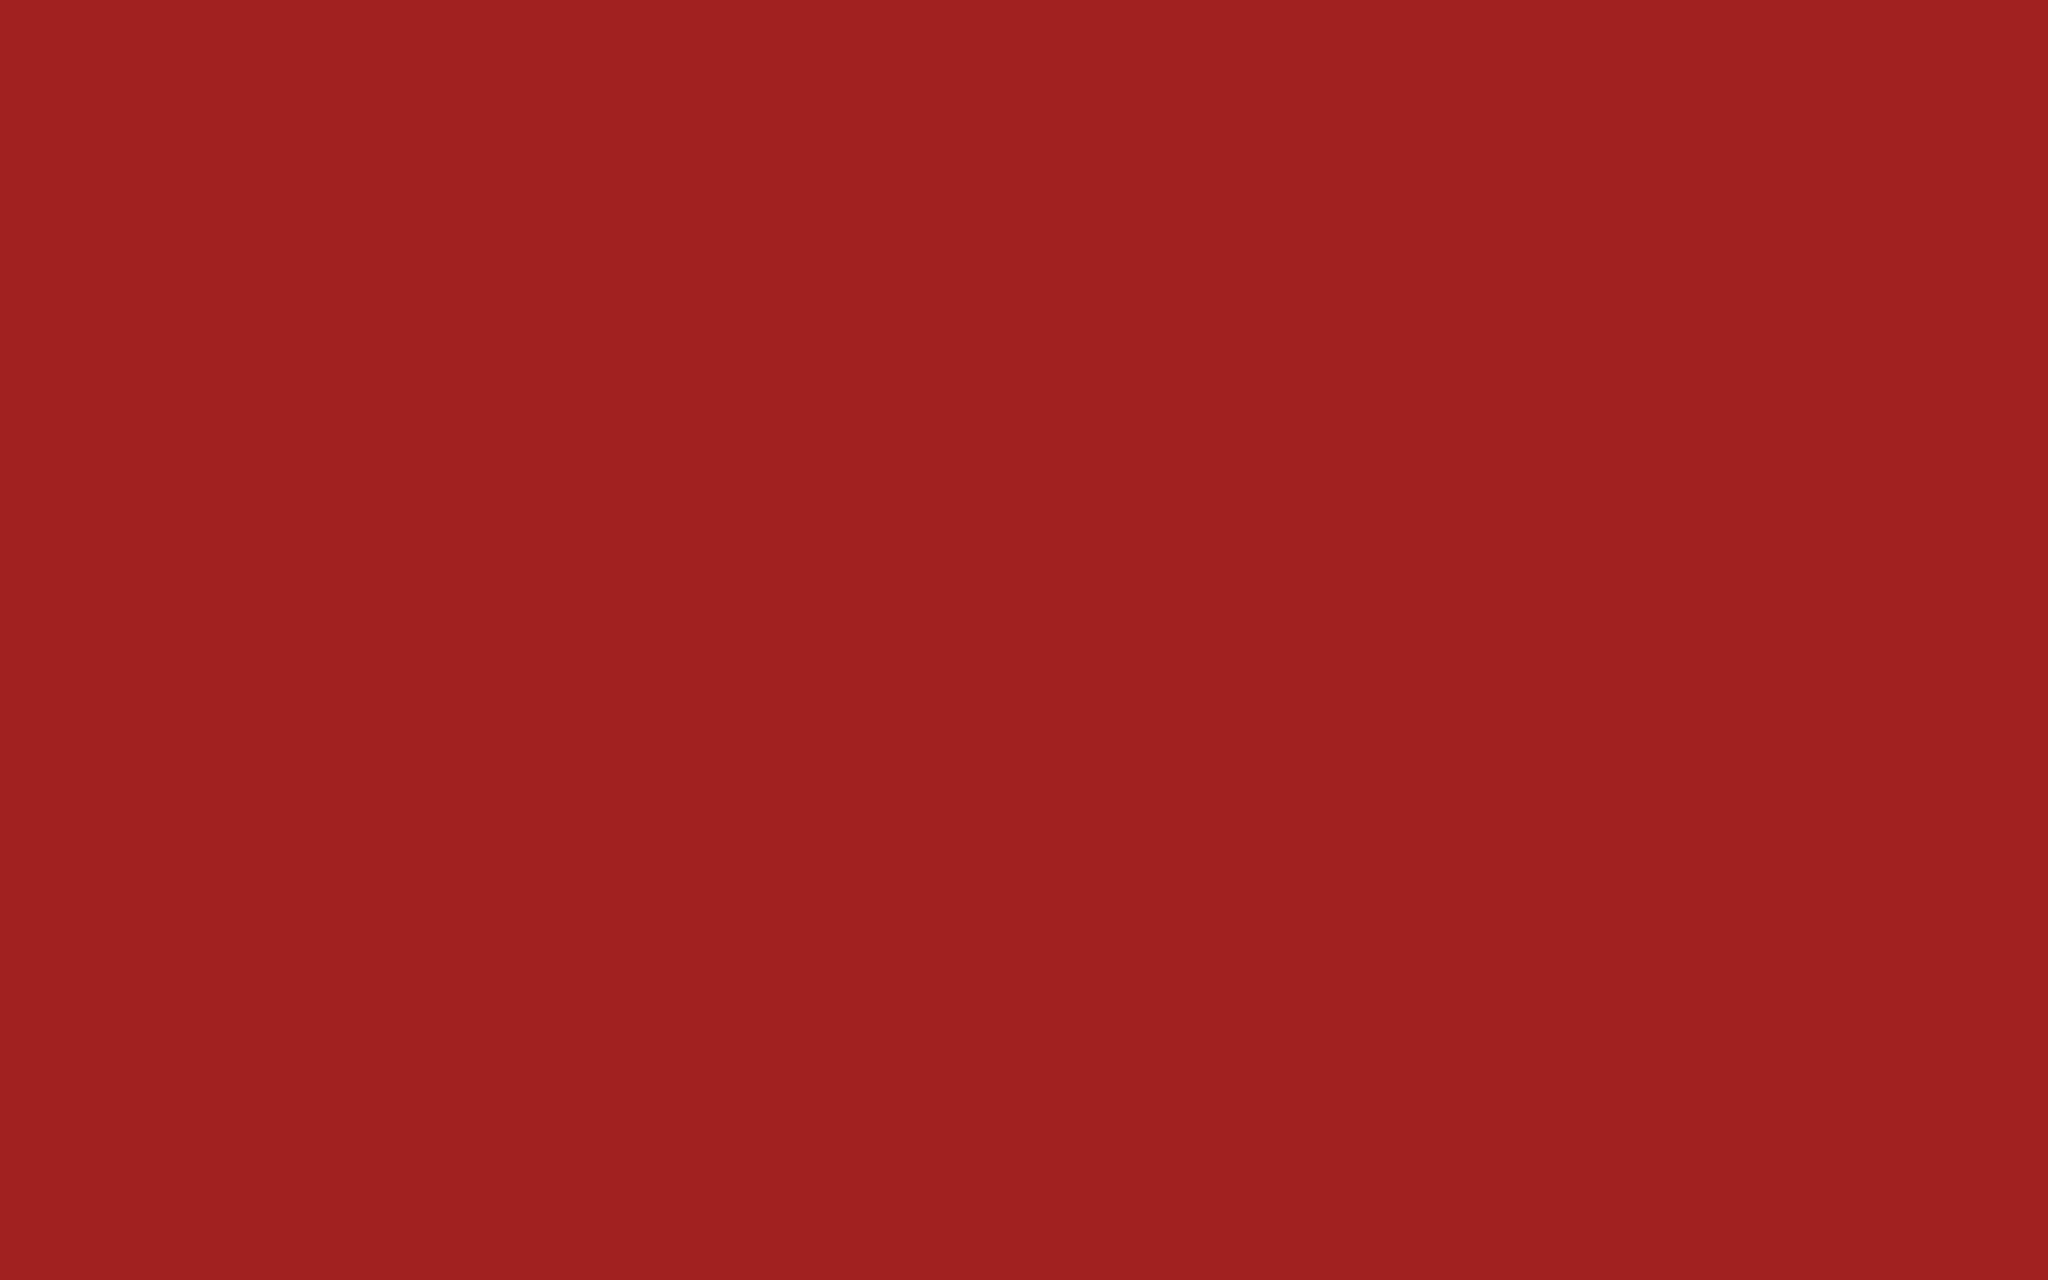 D12 - REGMENTAL RED